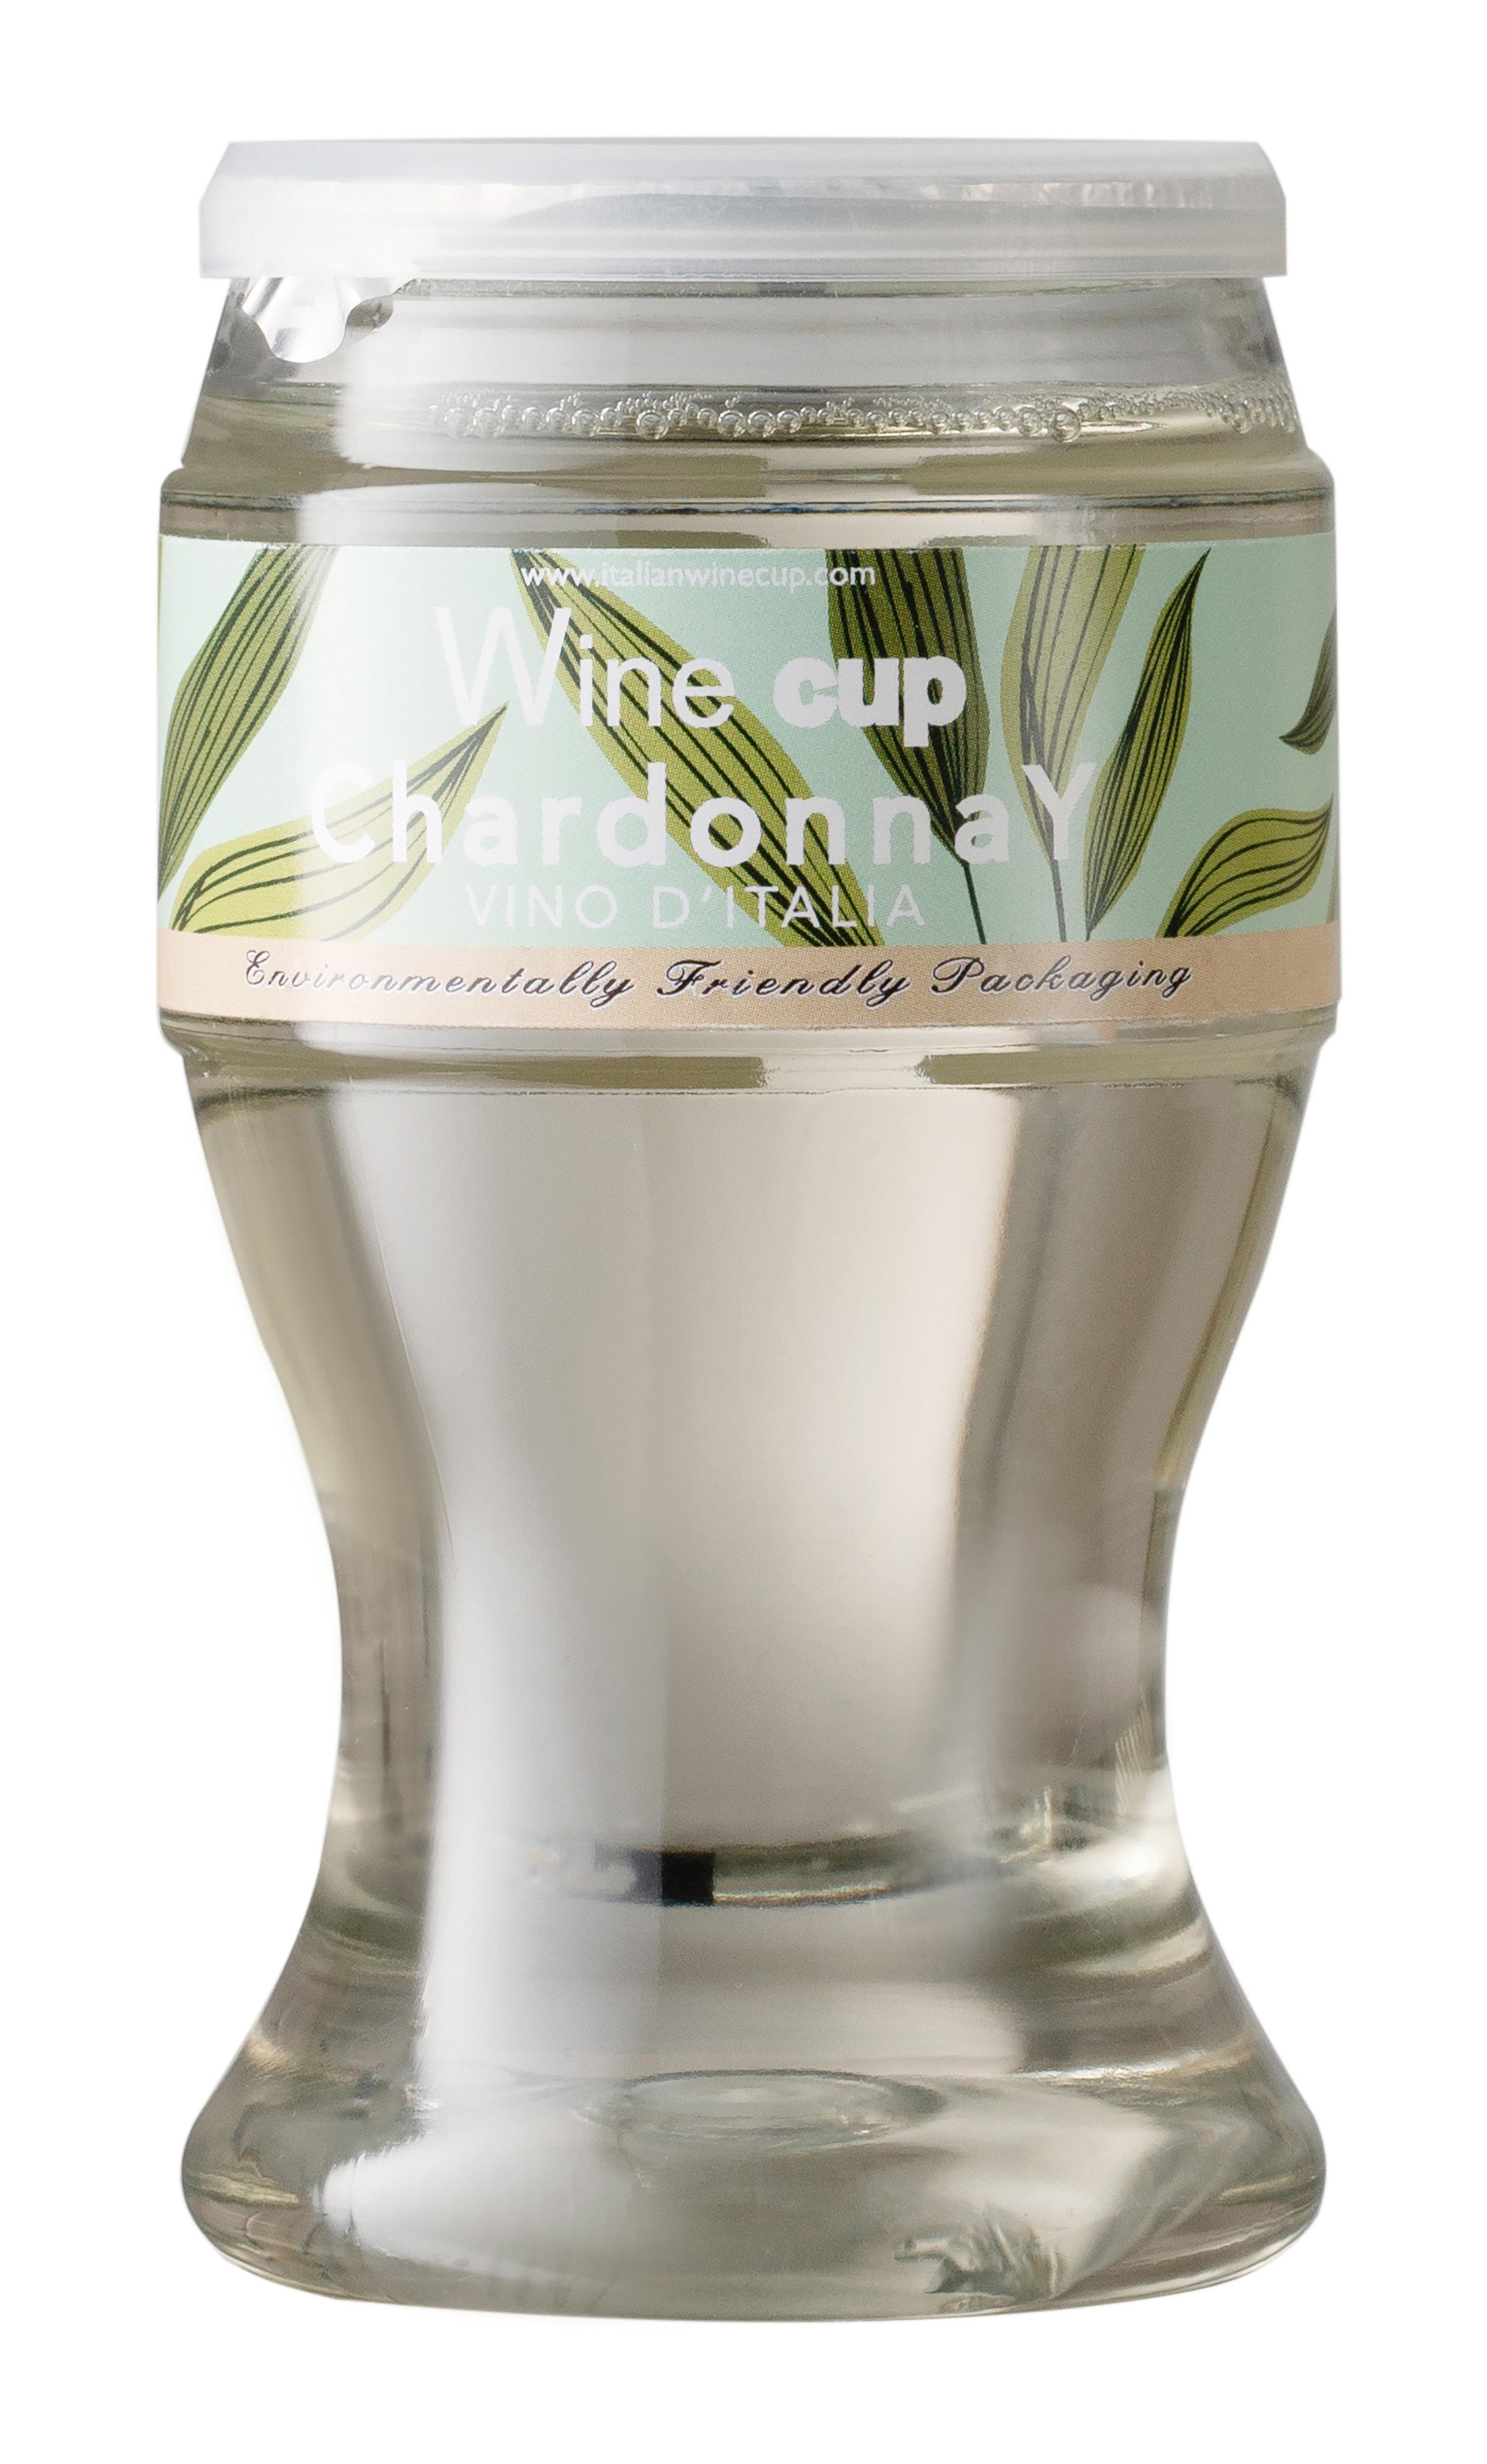 Wine Cup Chardonnay